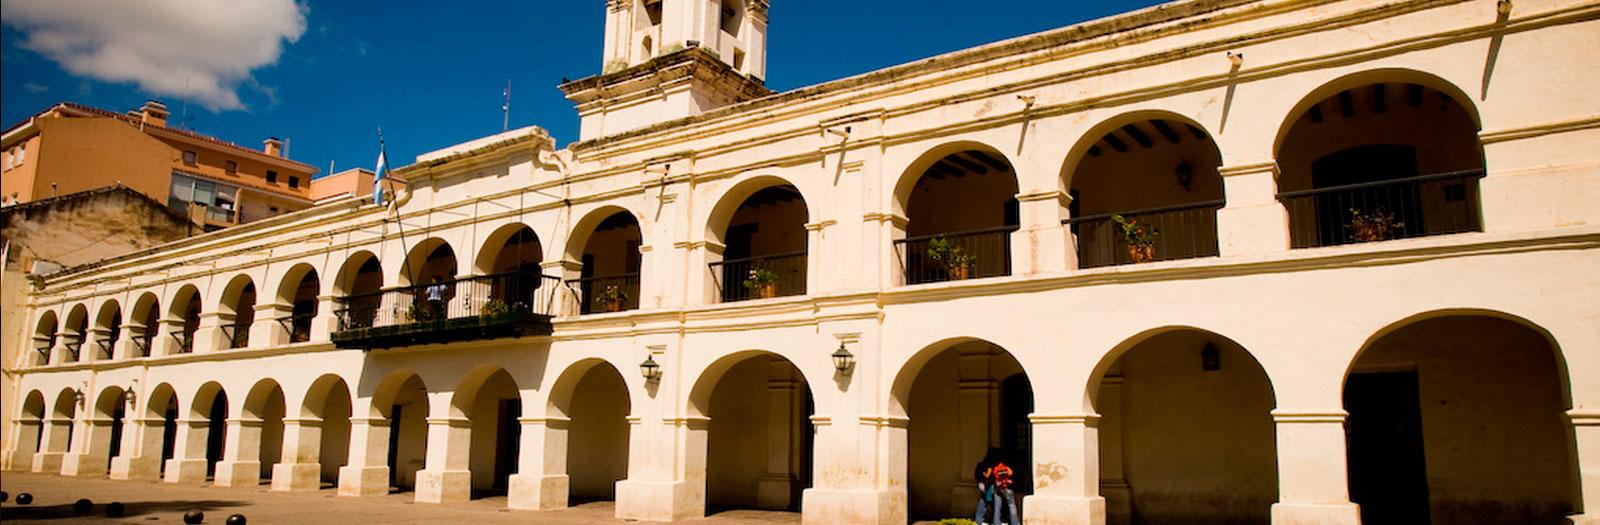 El Cabildo, Salta. Por Eliseo Miciu (gentileza de turismo.salta.gov.ar)